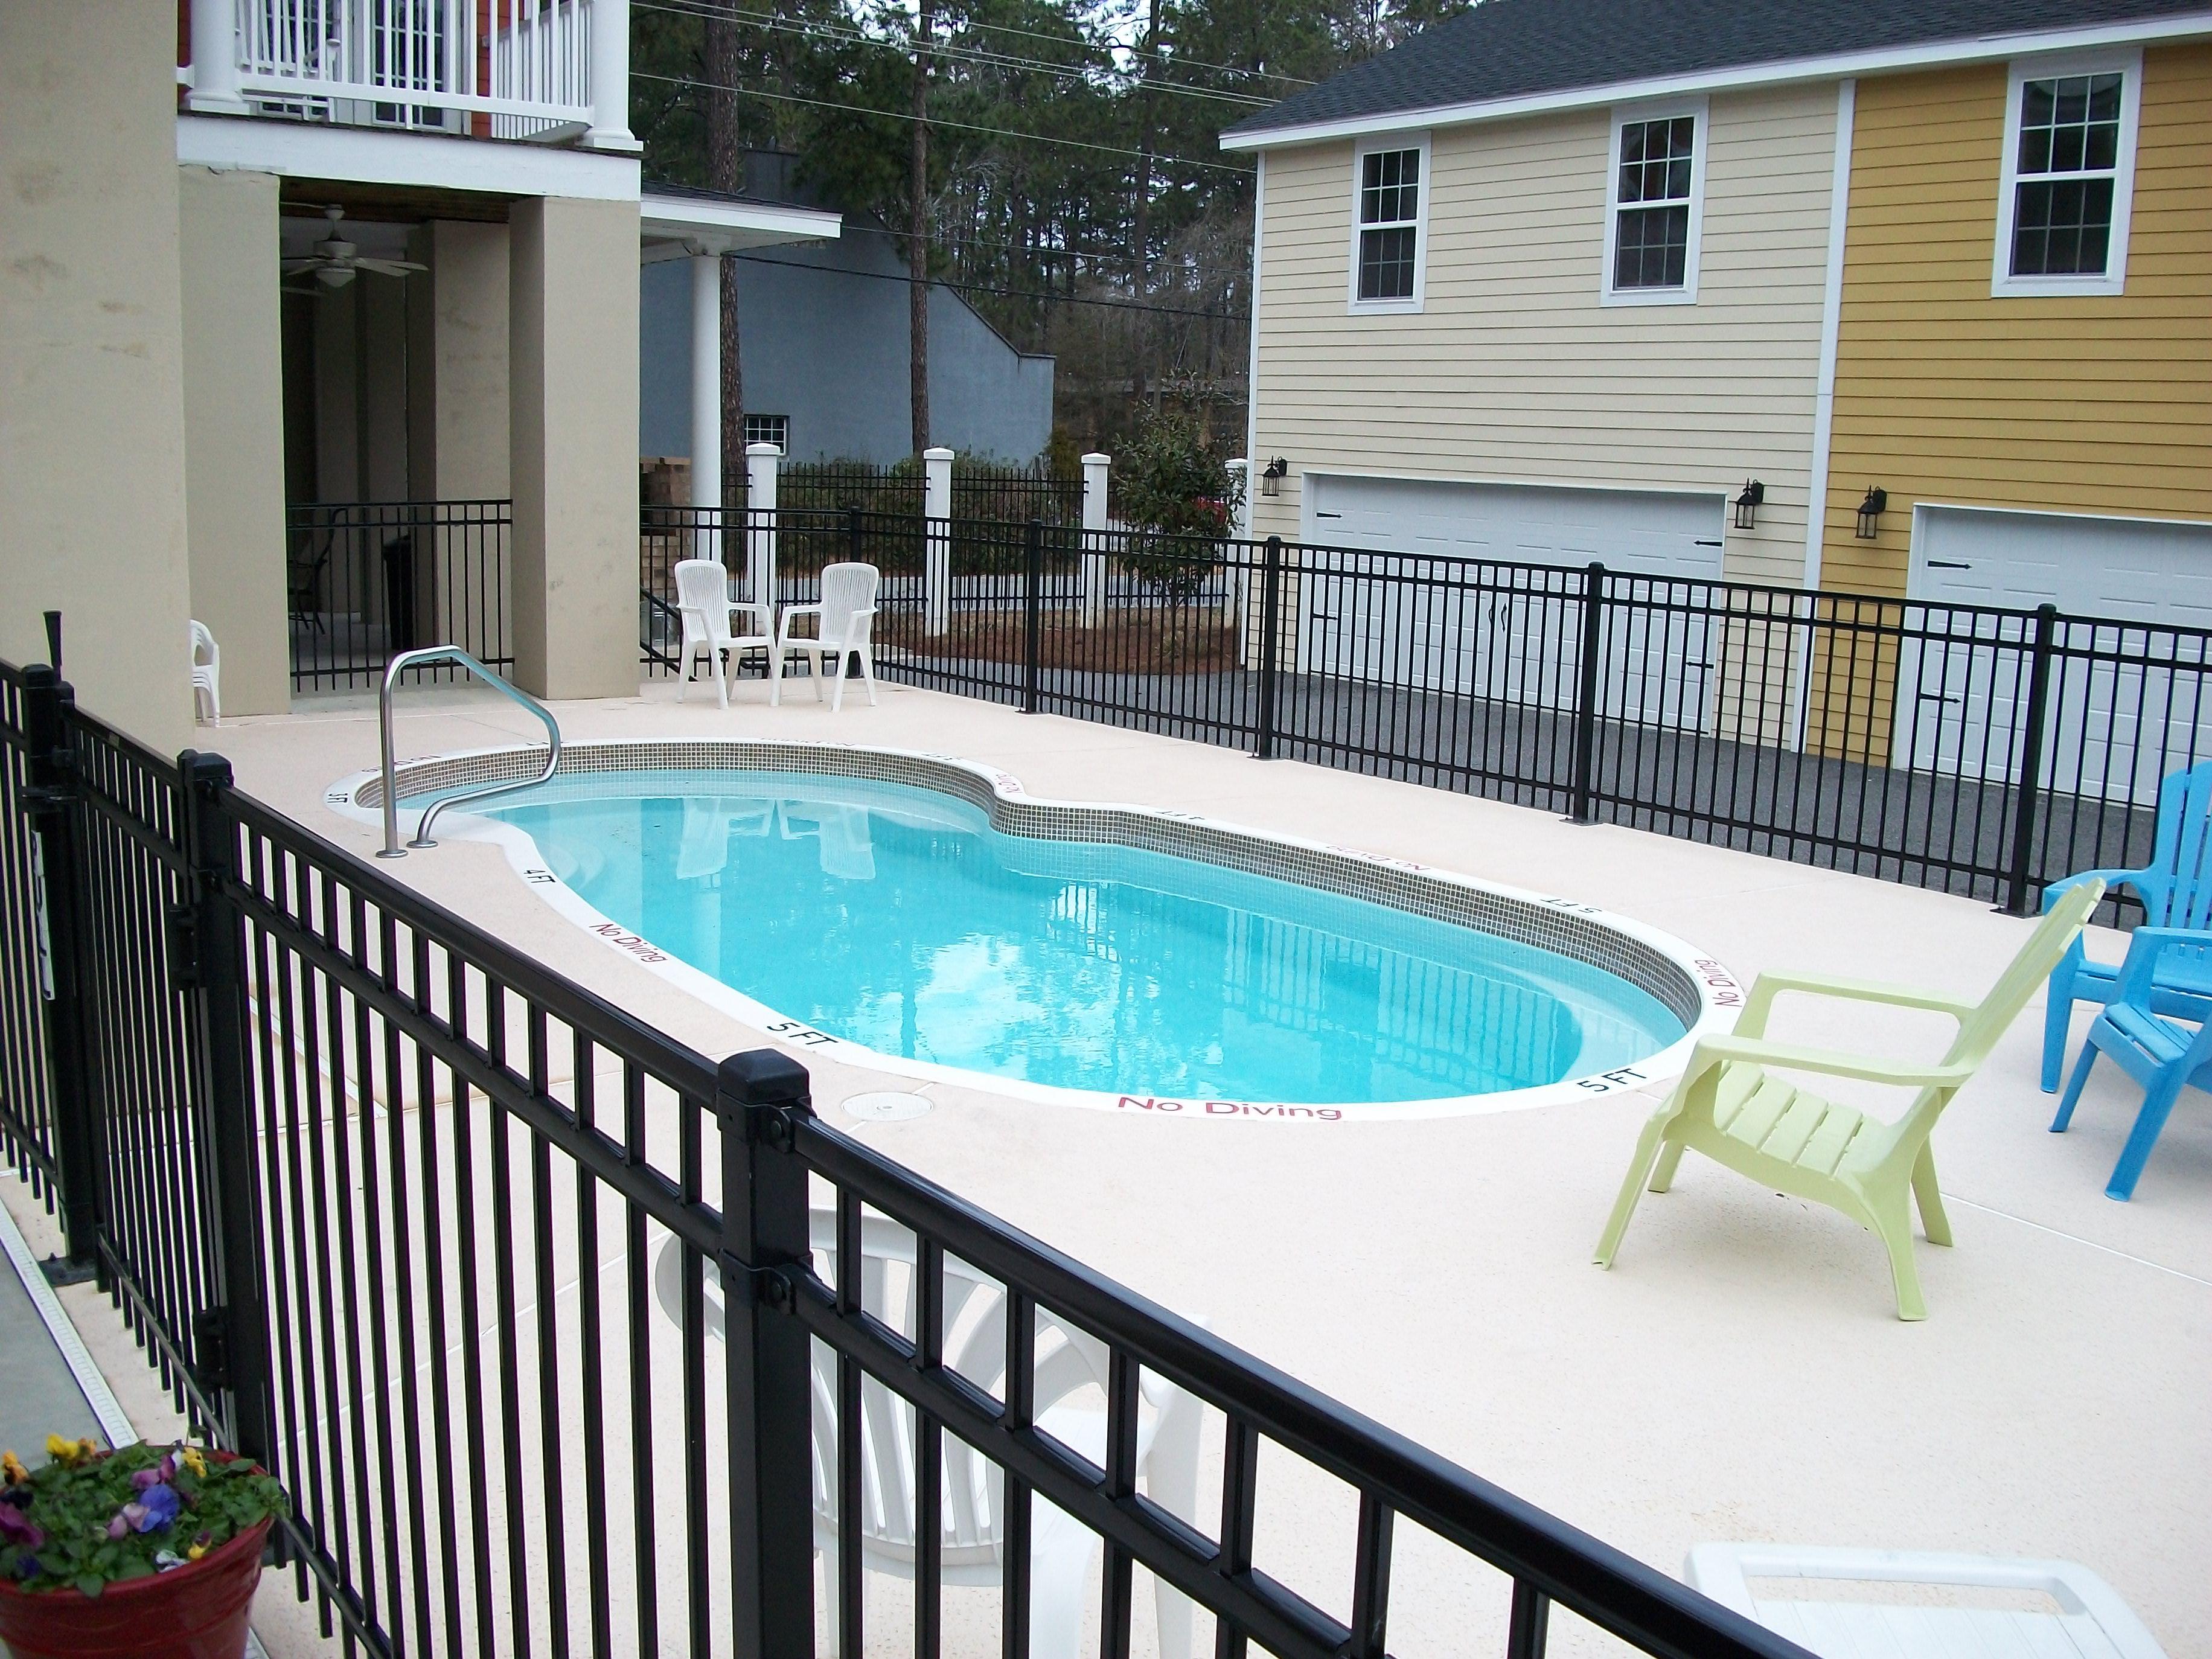 Fiberglass Pool| Commercial Installation| Custom Pool Builder| Patio| Statesboro, Georgia| Thompson Pools